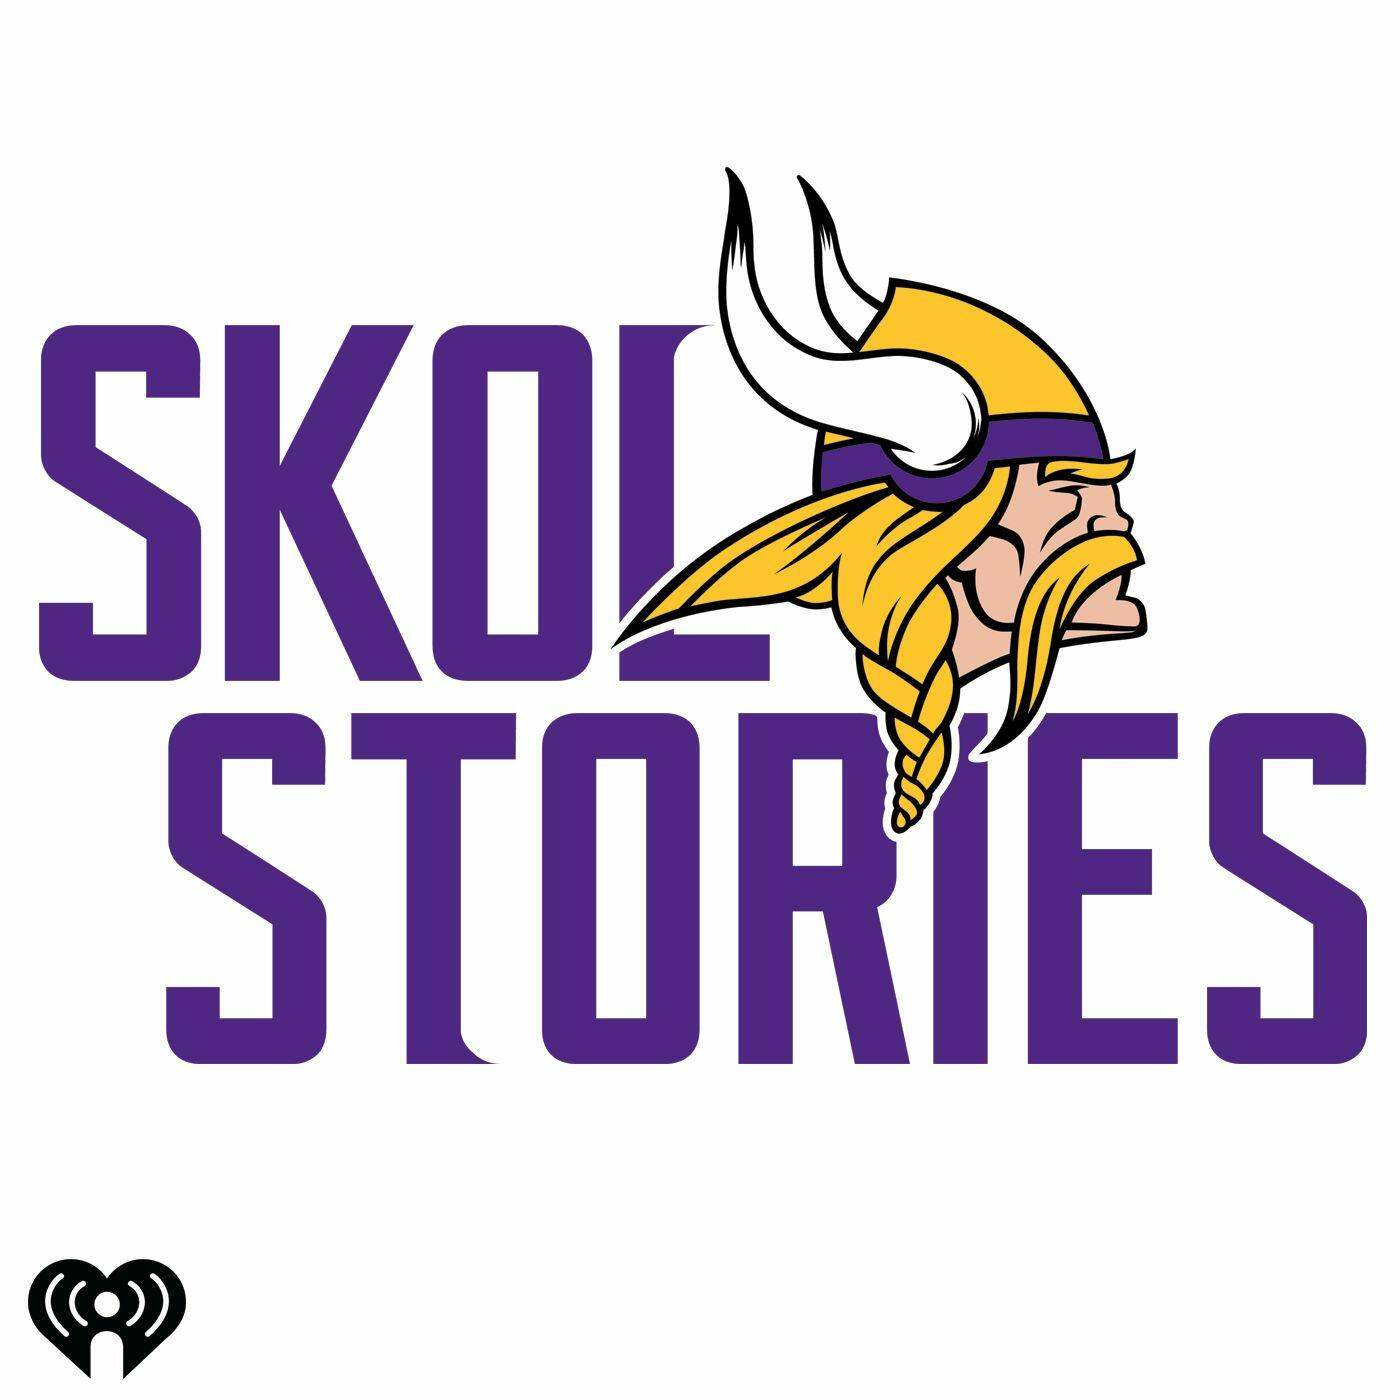 Minnesota Vikings - Skol Stories